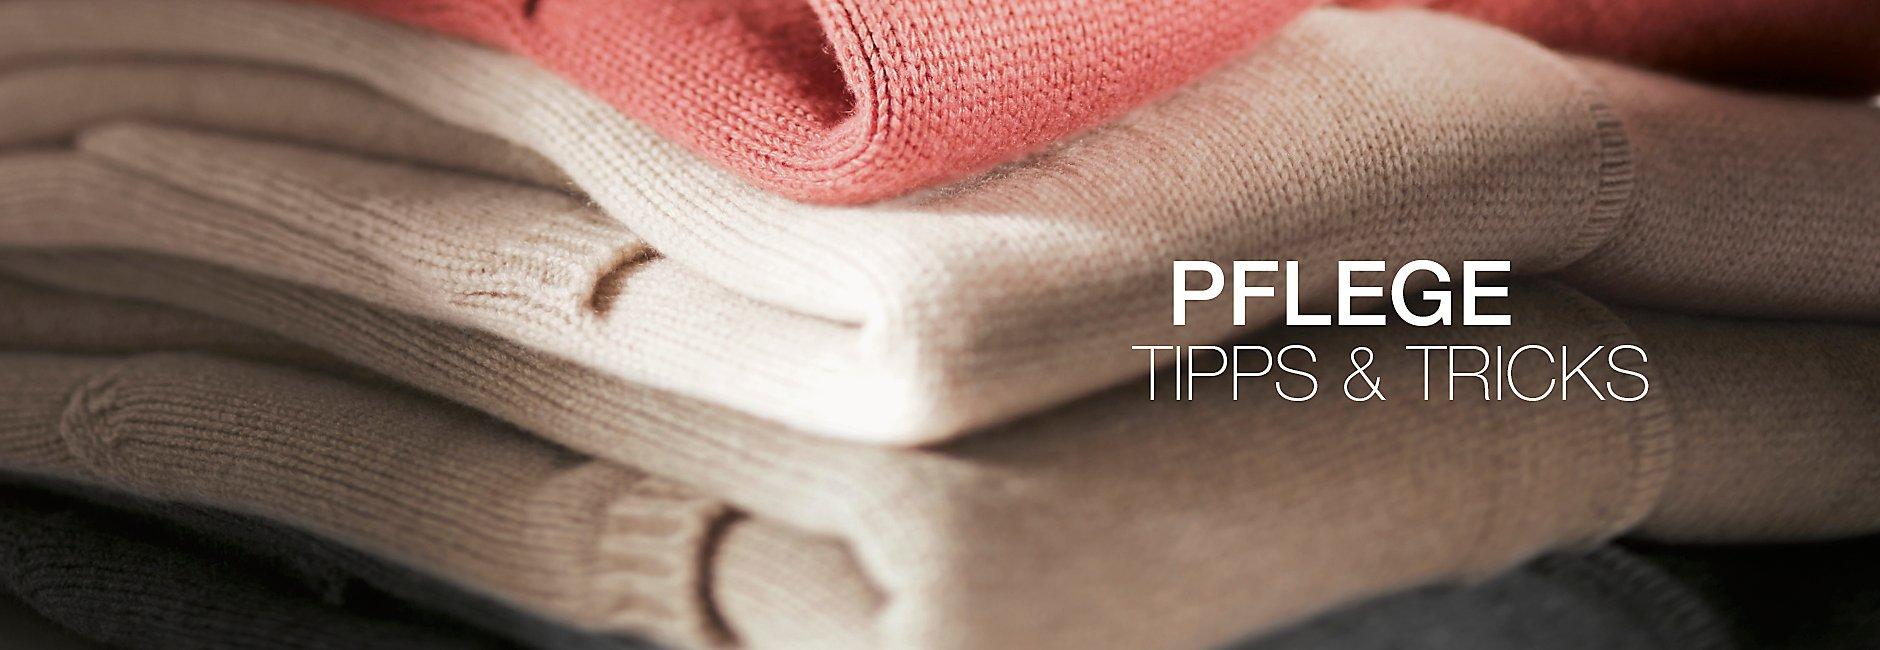 Pflege Tipss & Tricks